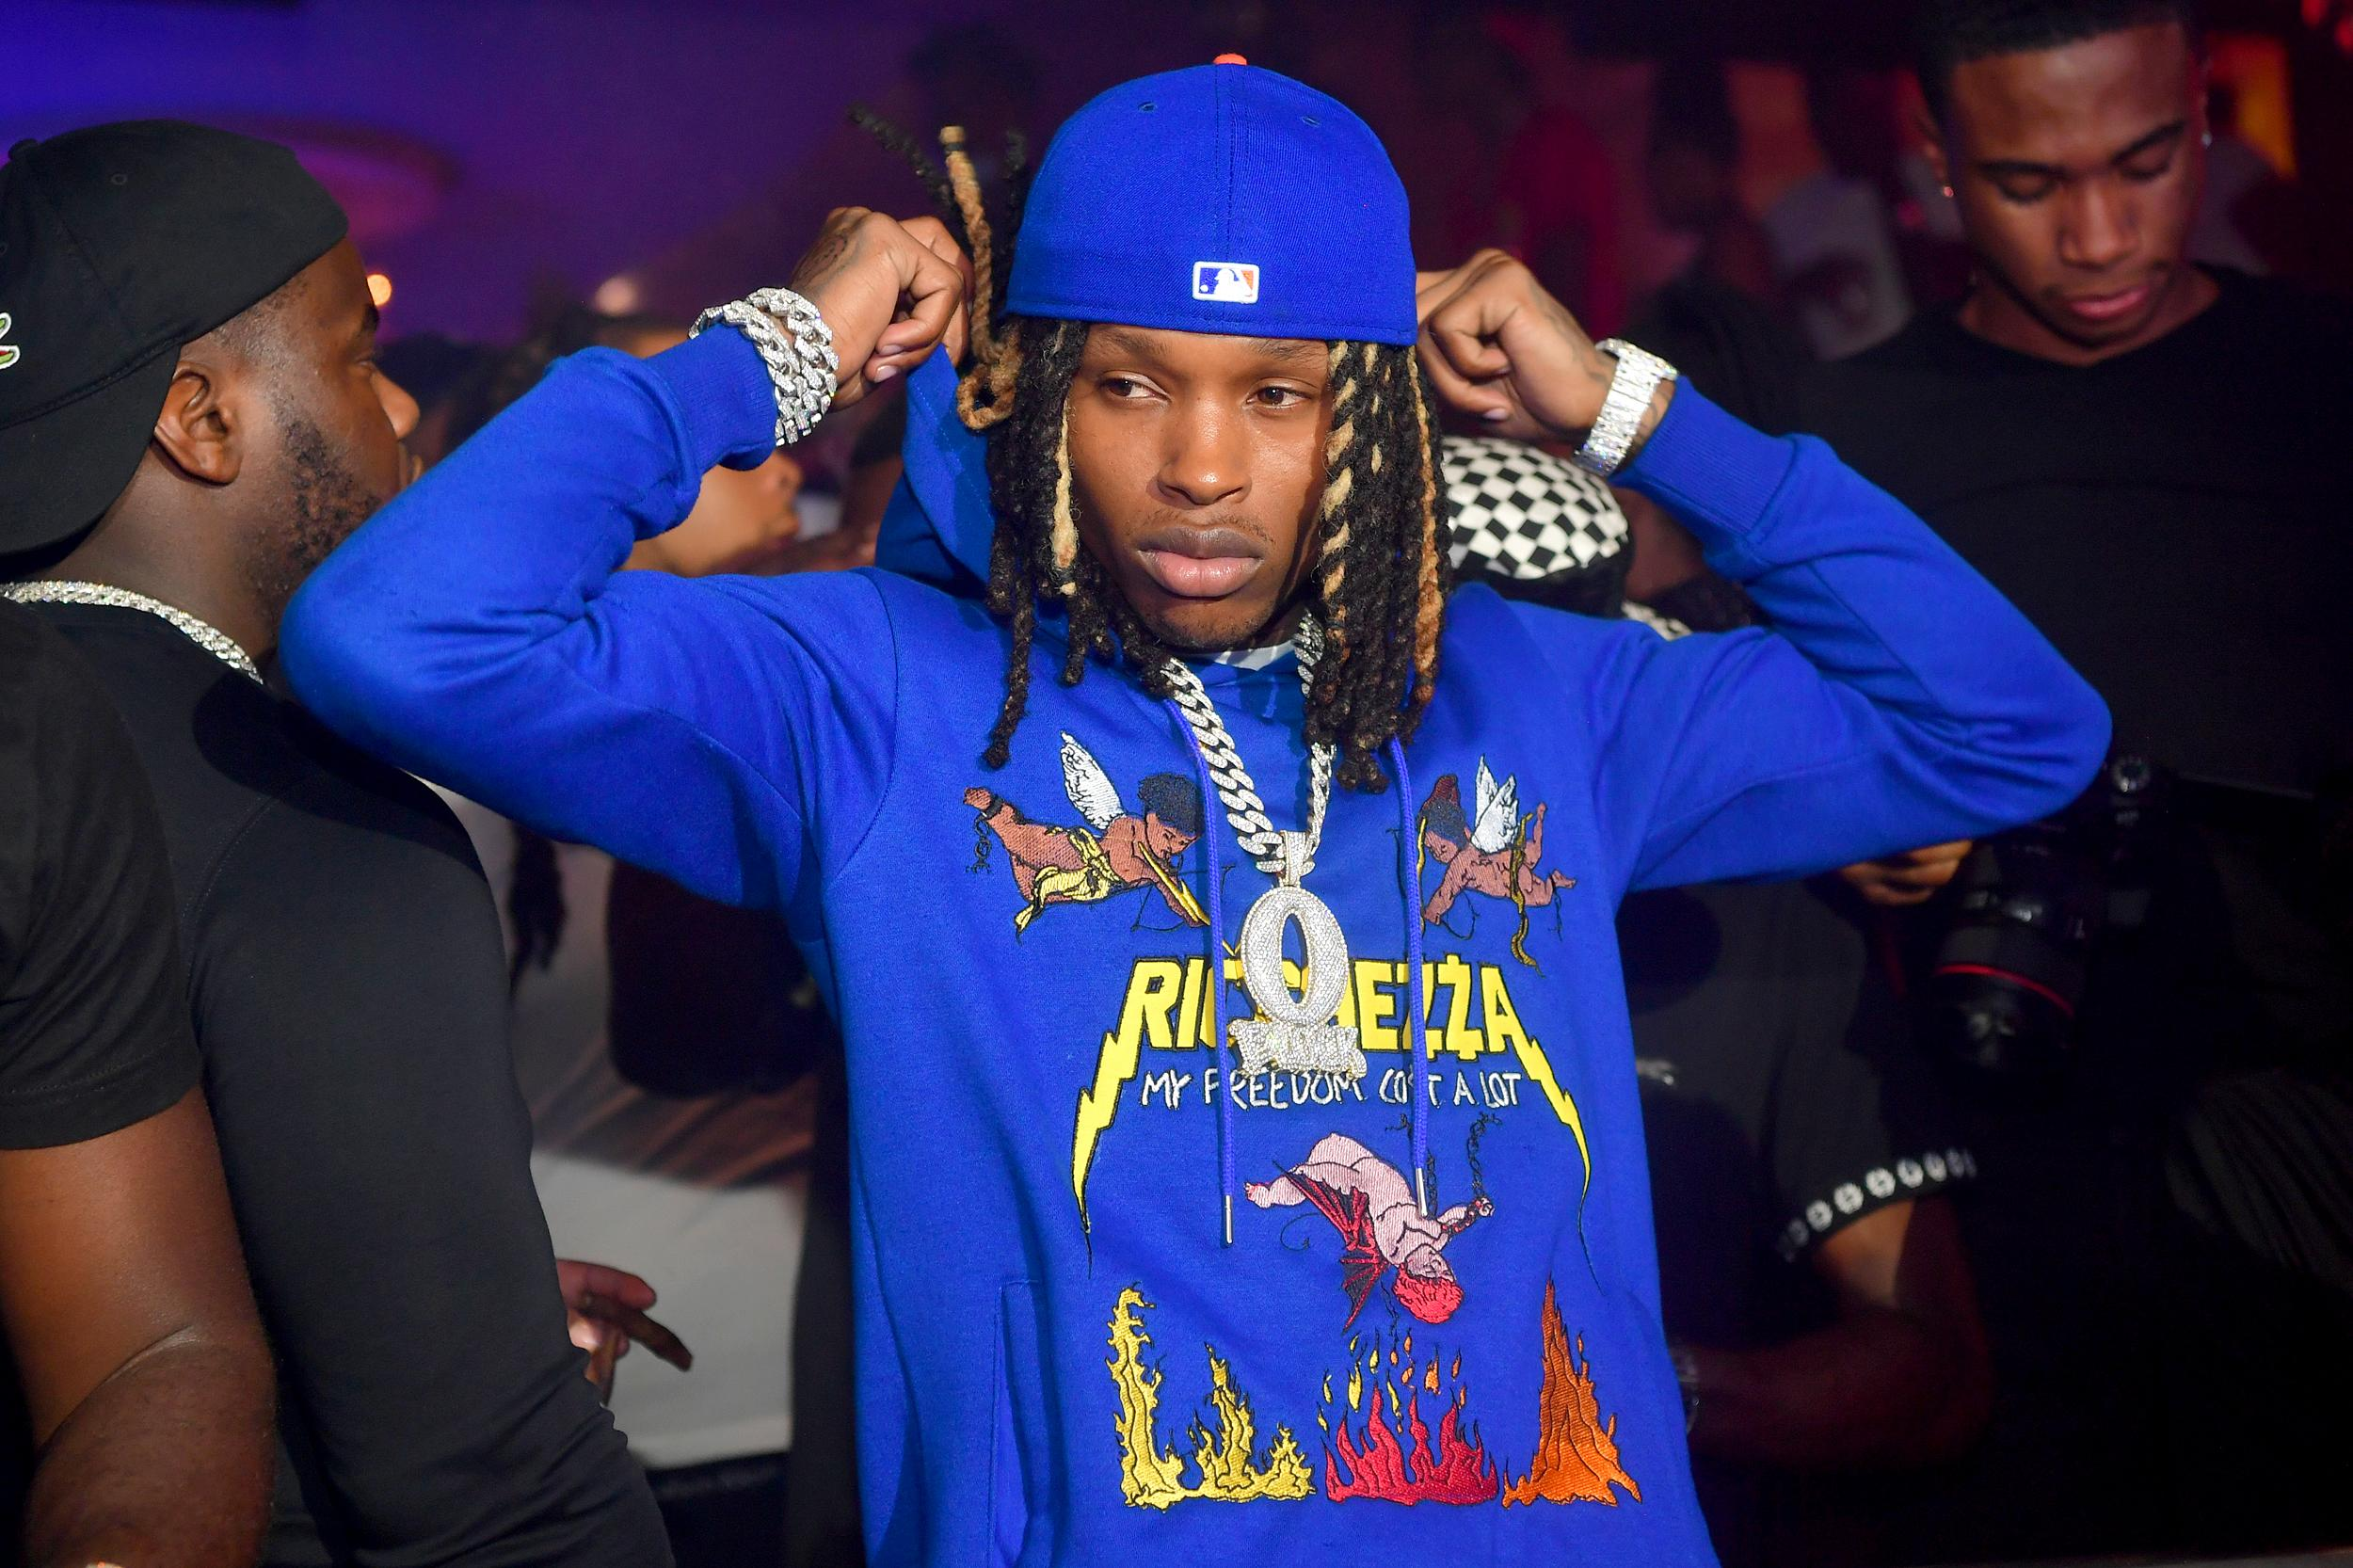 Rapper King Von, 2 others, fatally shot in Atlanta